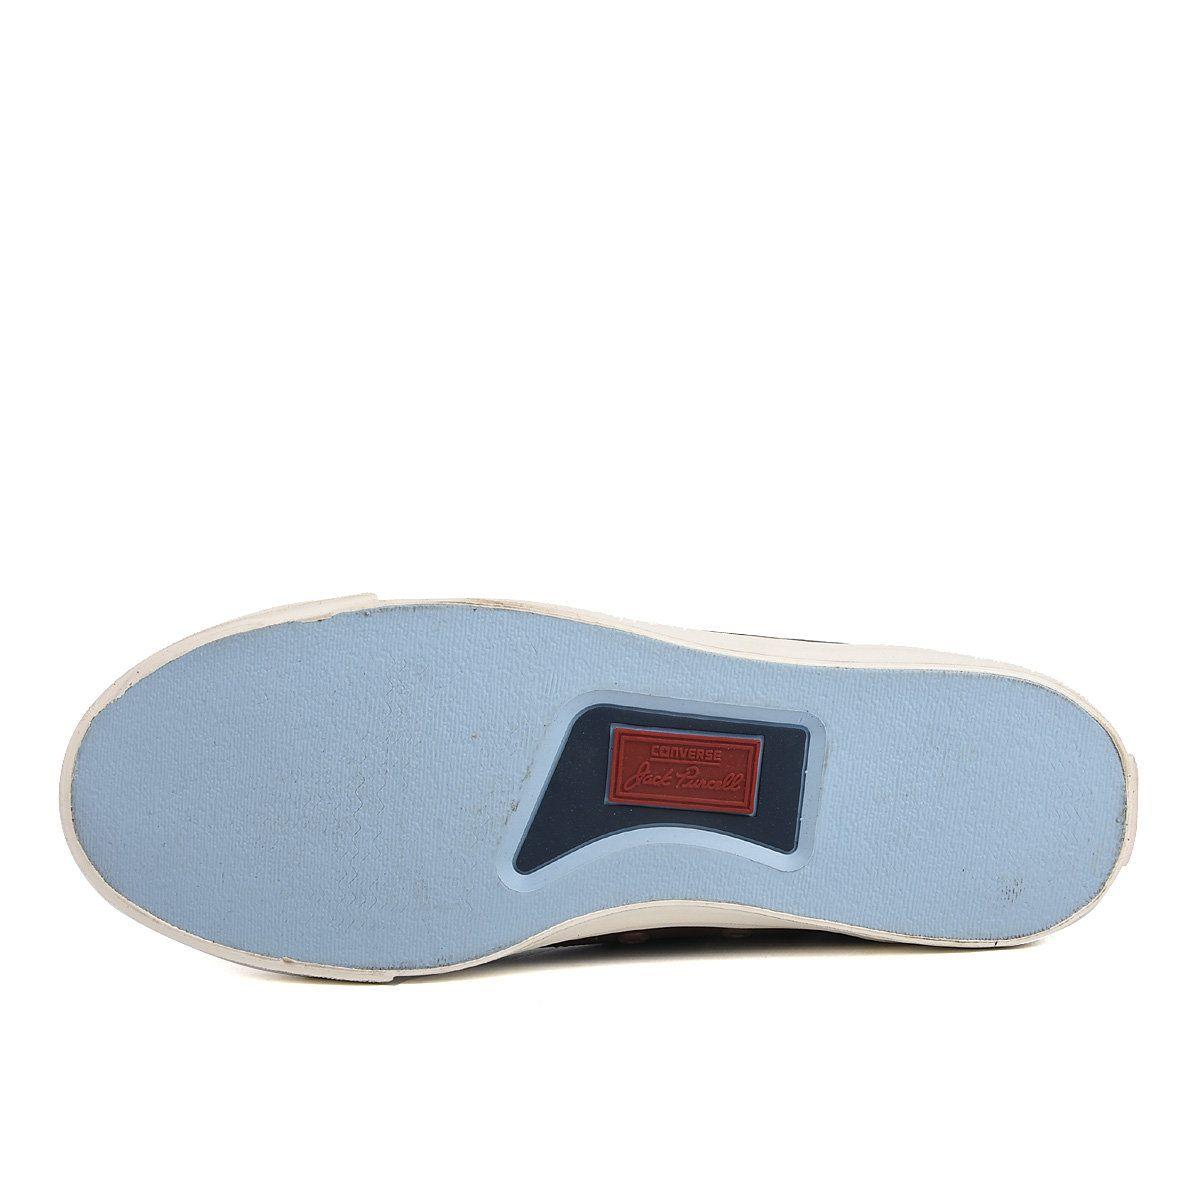 e264e10c735e Jack Purcell cortical open laugh casual shoes CS154144  converse  shoes  Brown Converse